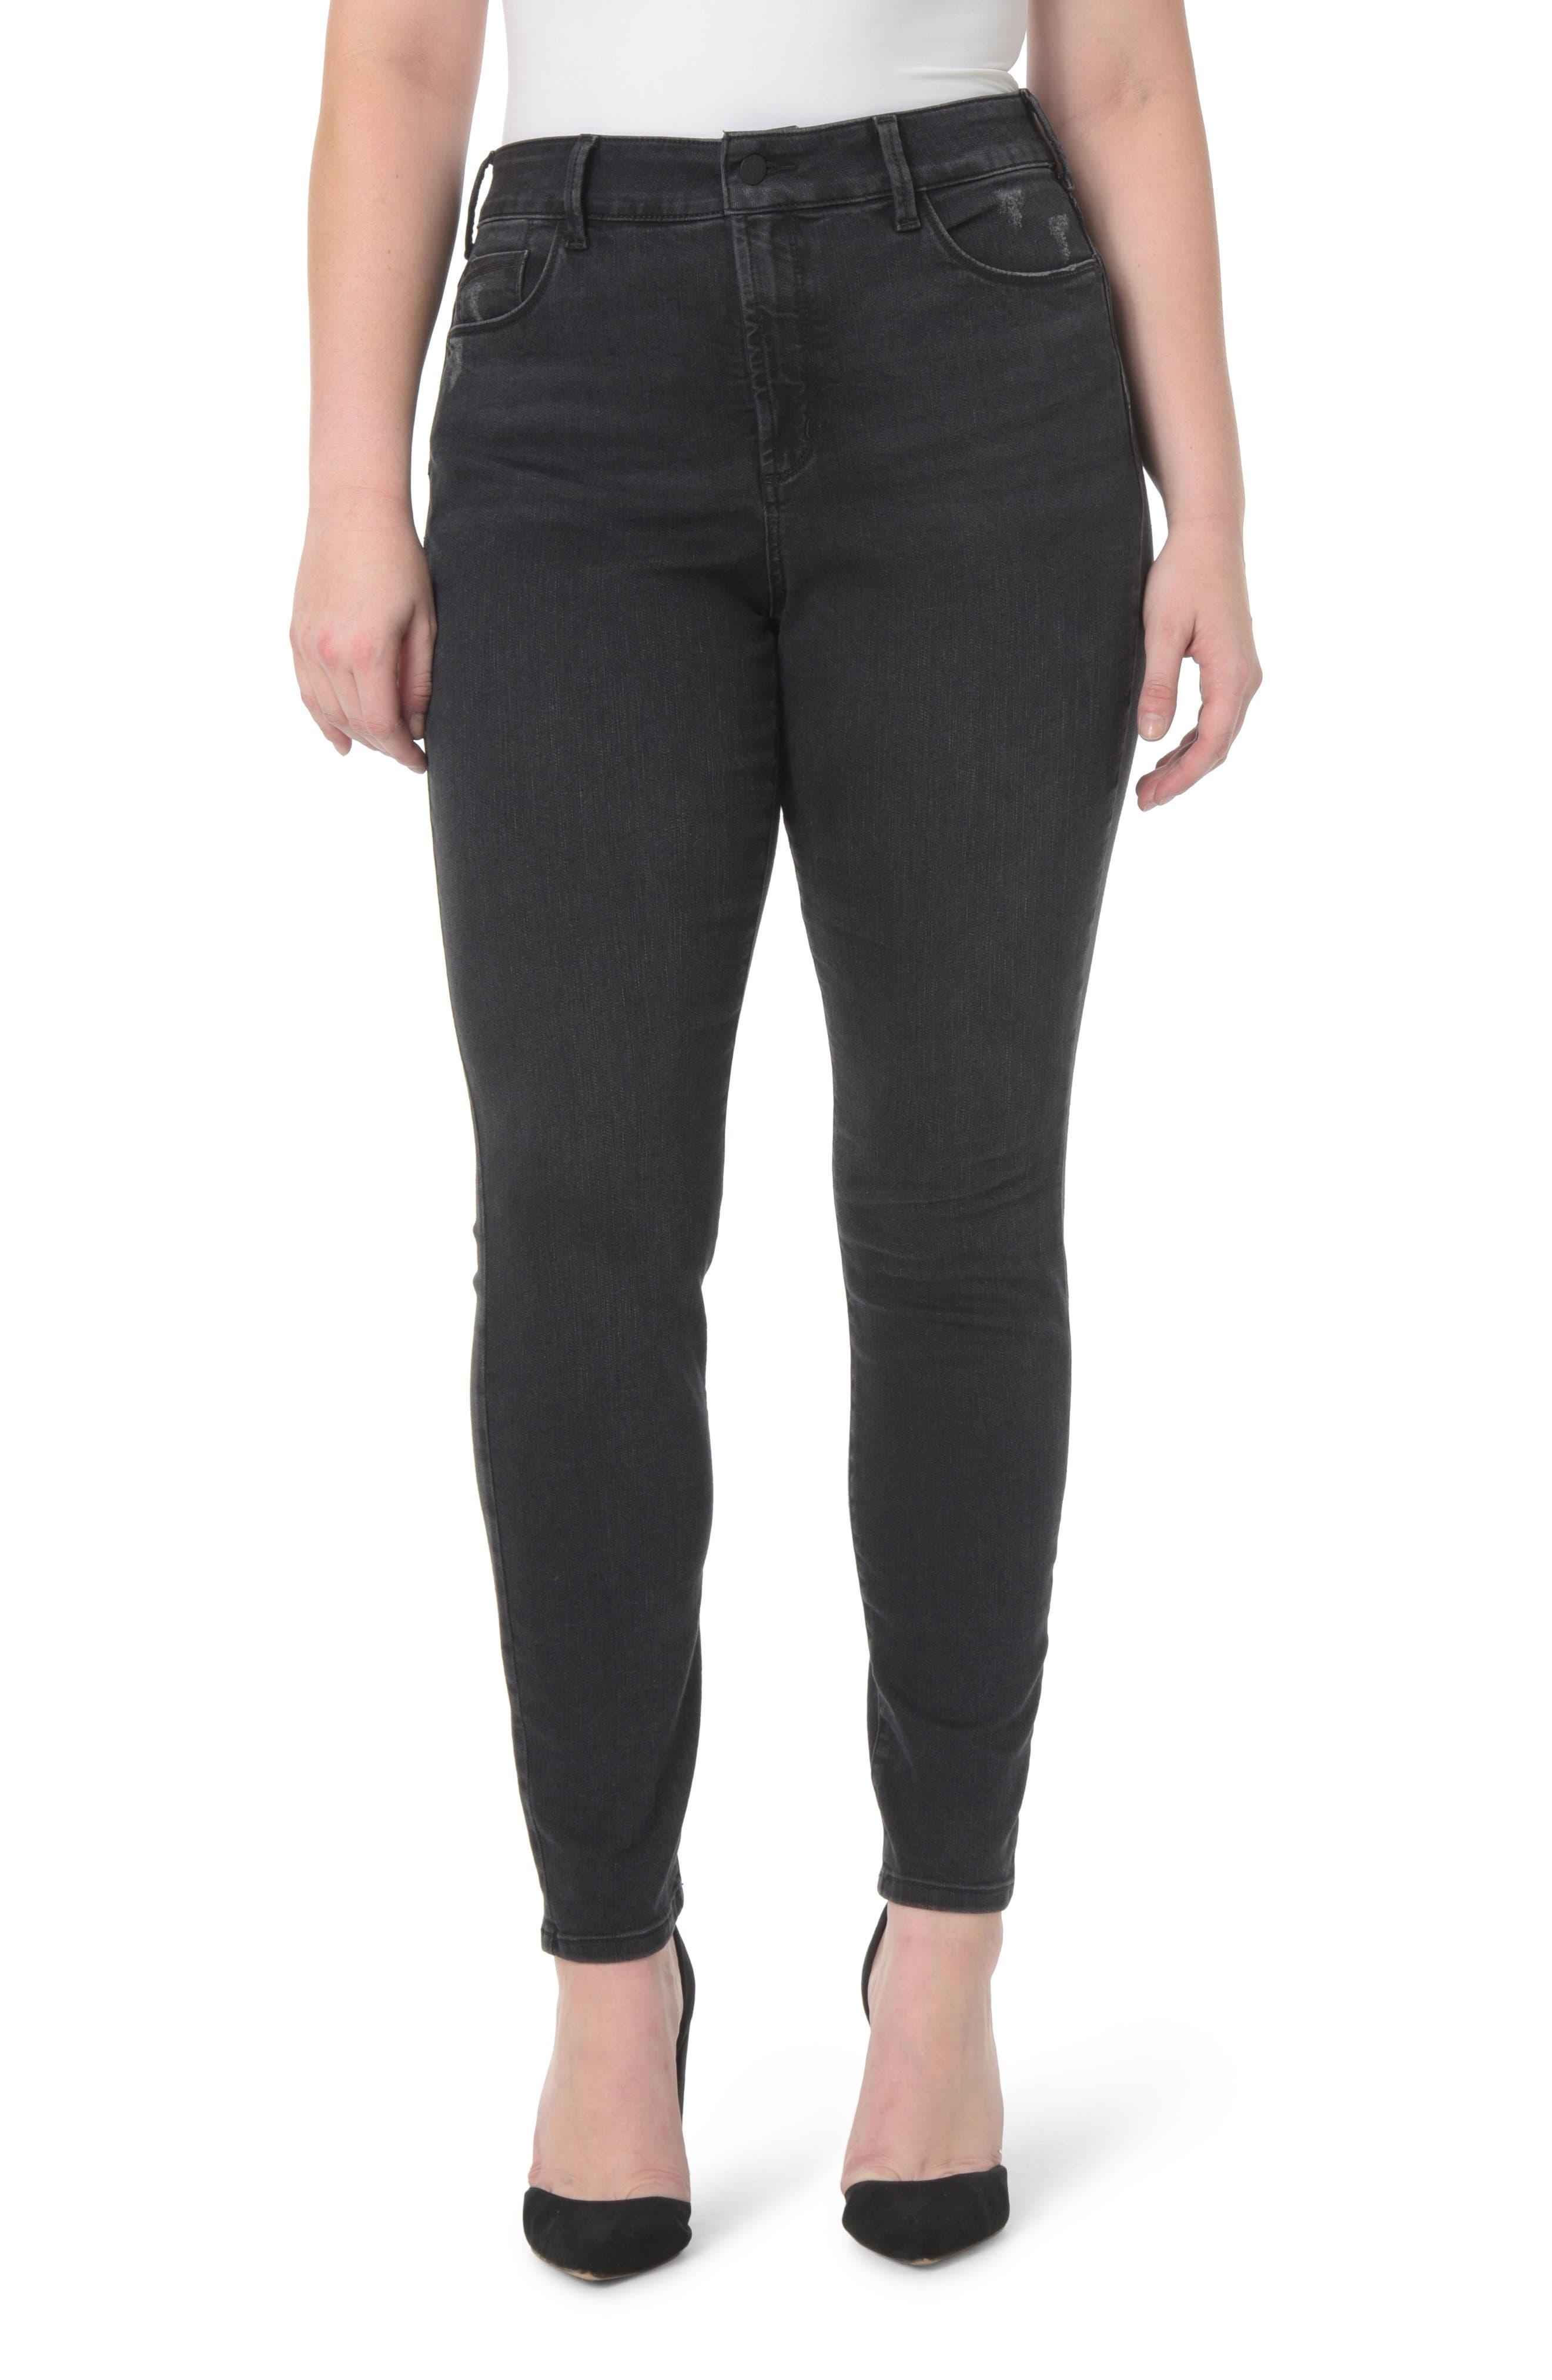 Main Image - NYDJ Alina Uplift Stretch Skinny Jeans (Plus Size)